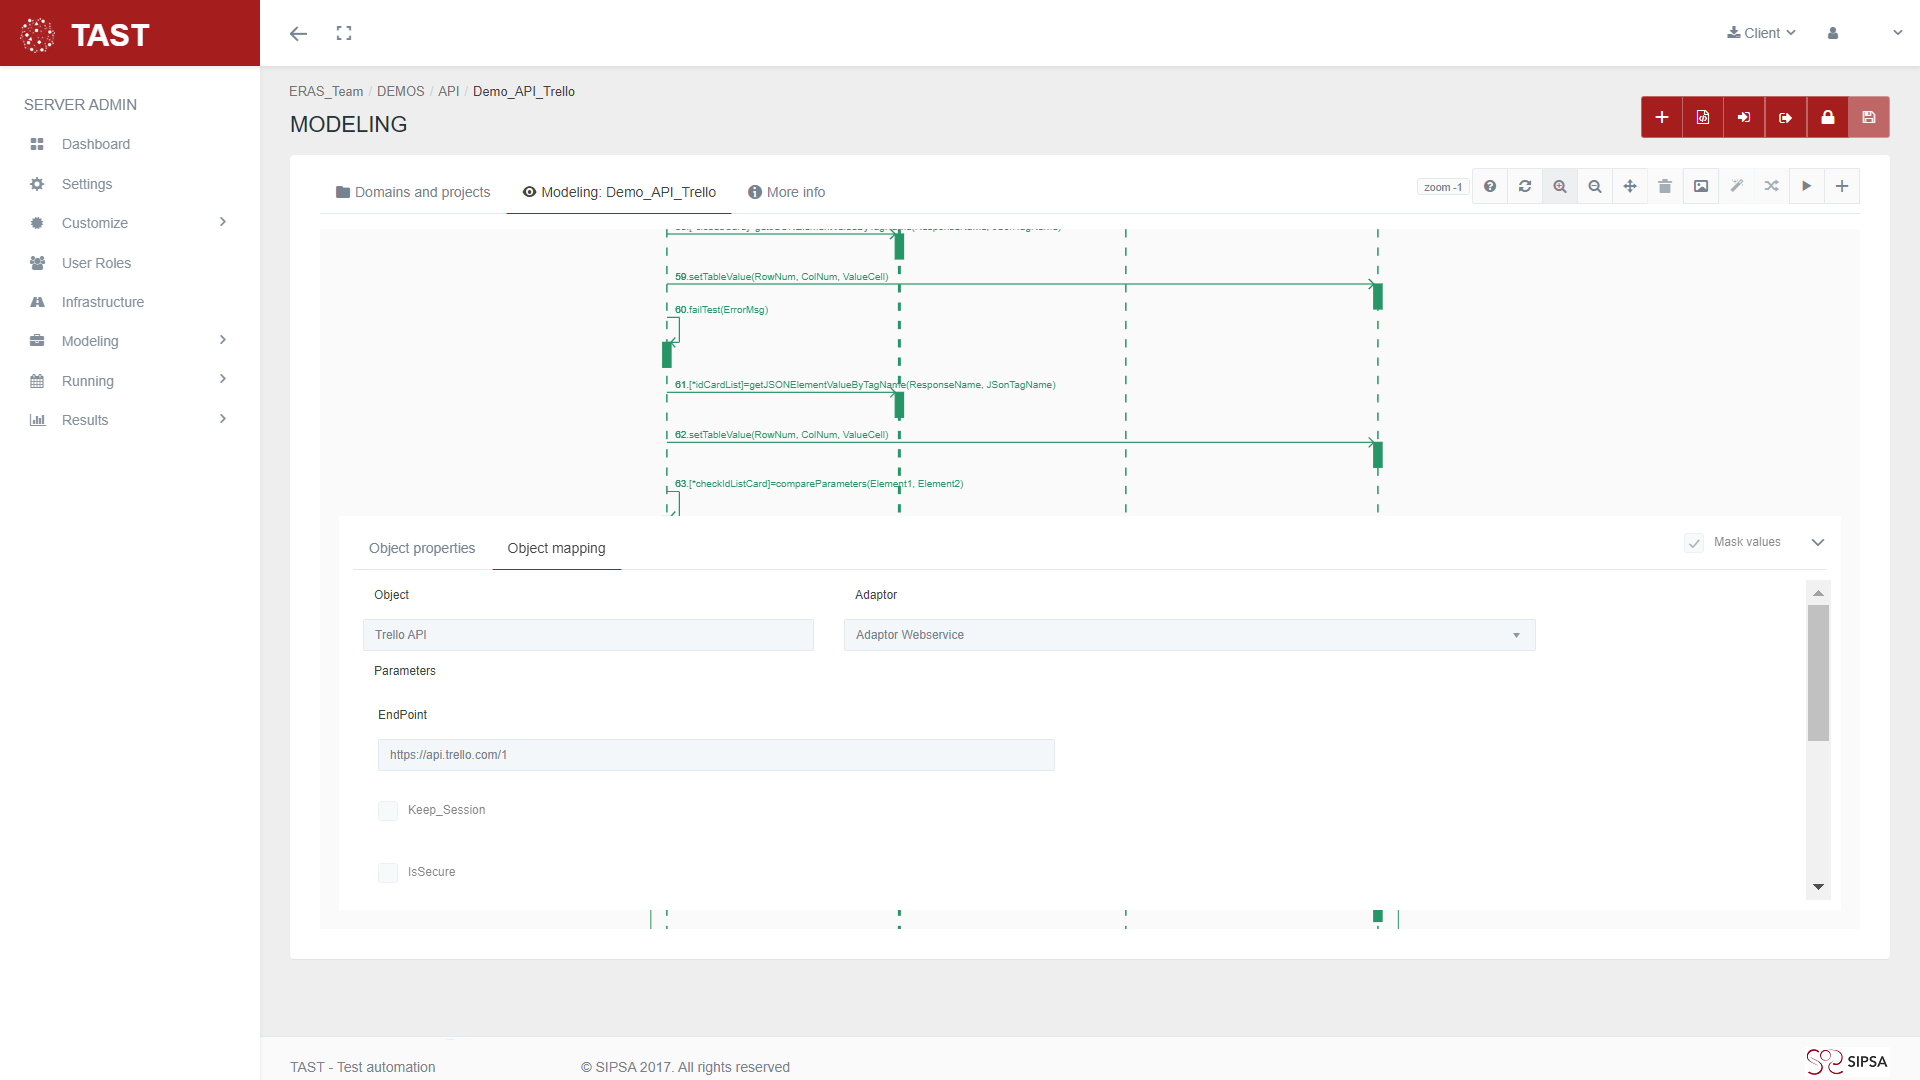 UML API Trello Excel, object mapping Adaptor Webservice